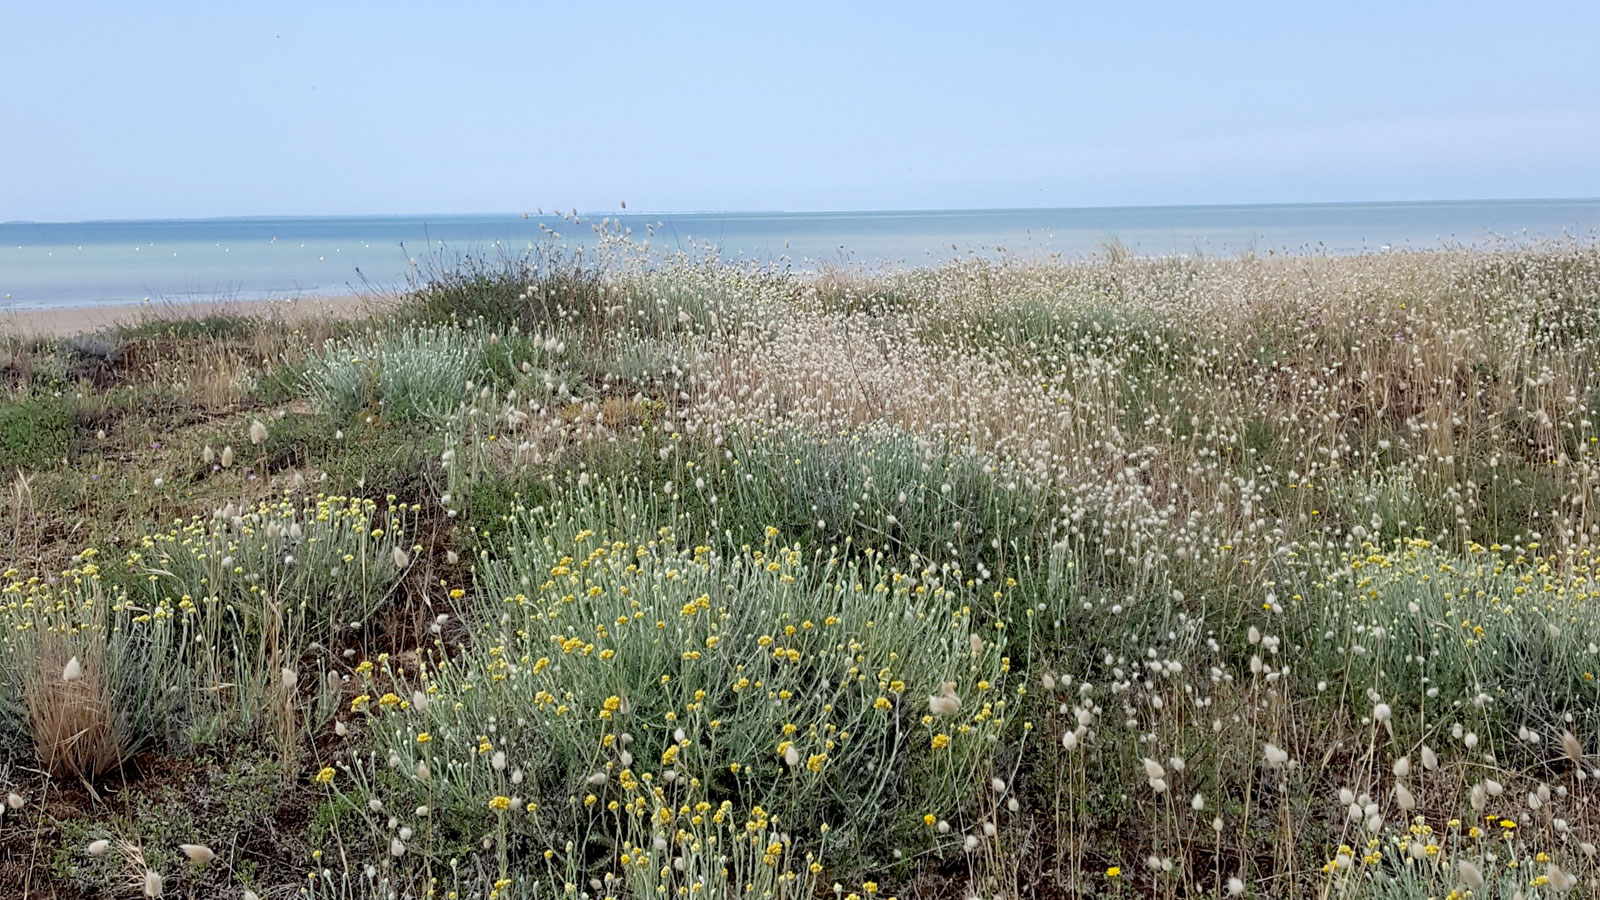 Balade-a-pied-randonnee-vendee-sentier-de-la-dune-au-Marais4